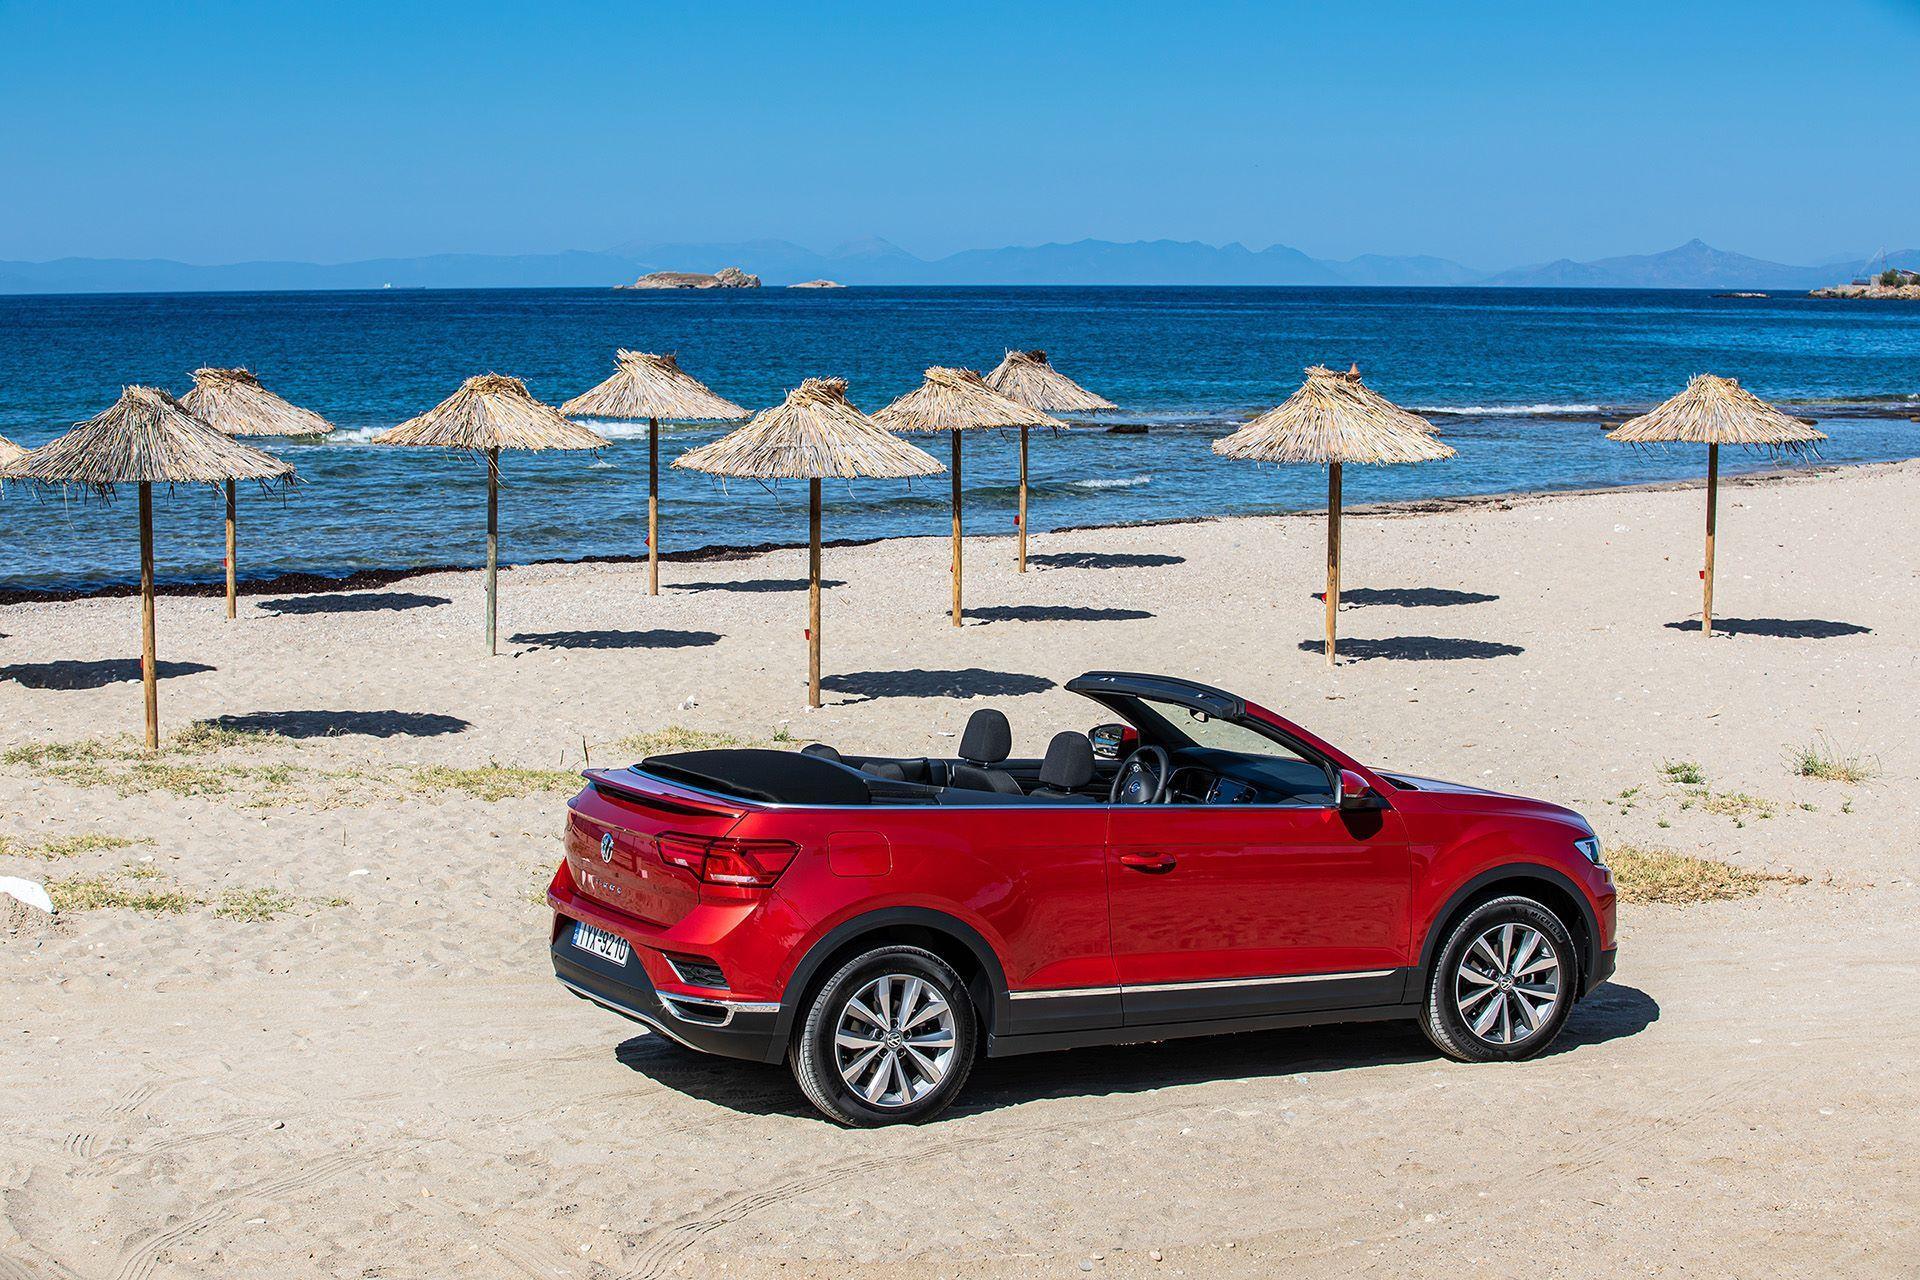 Volkswagen-T-Roc-Cabriolet-Greece-21